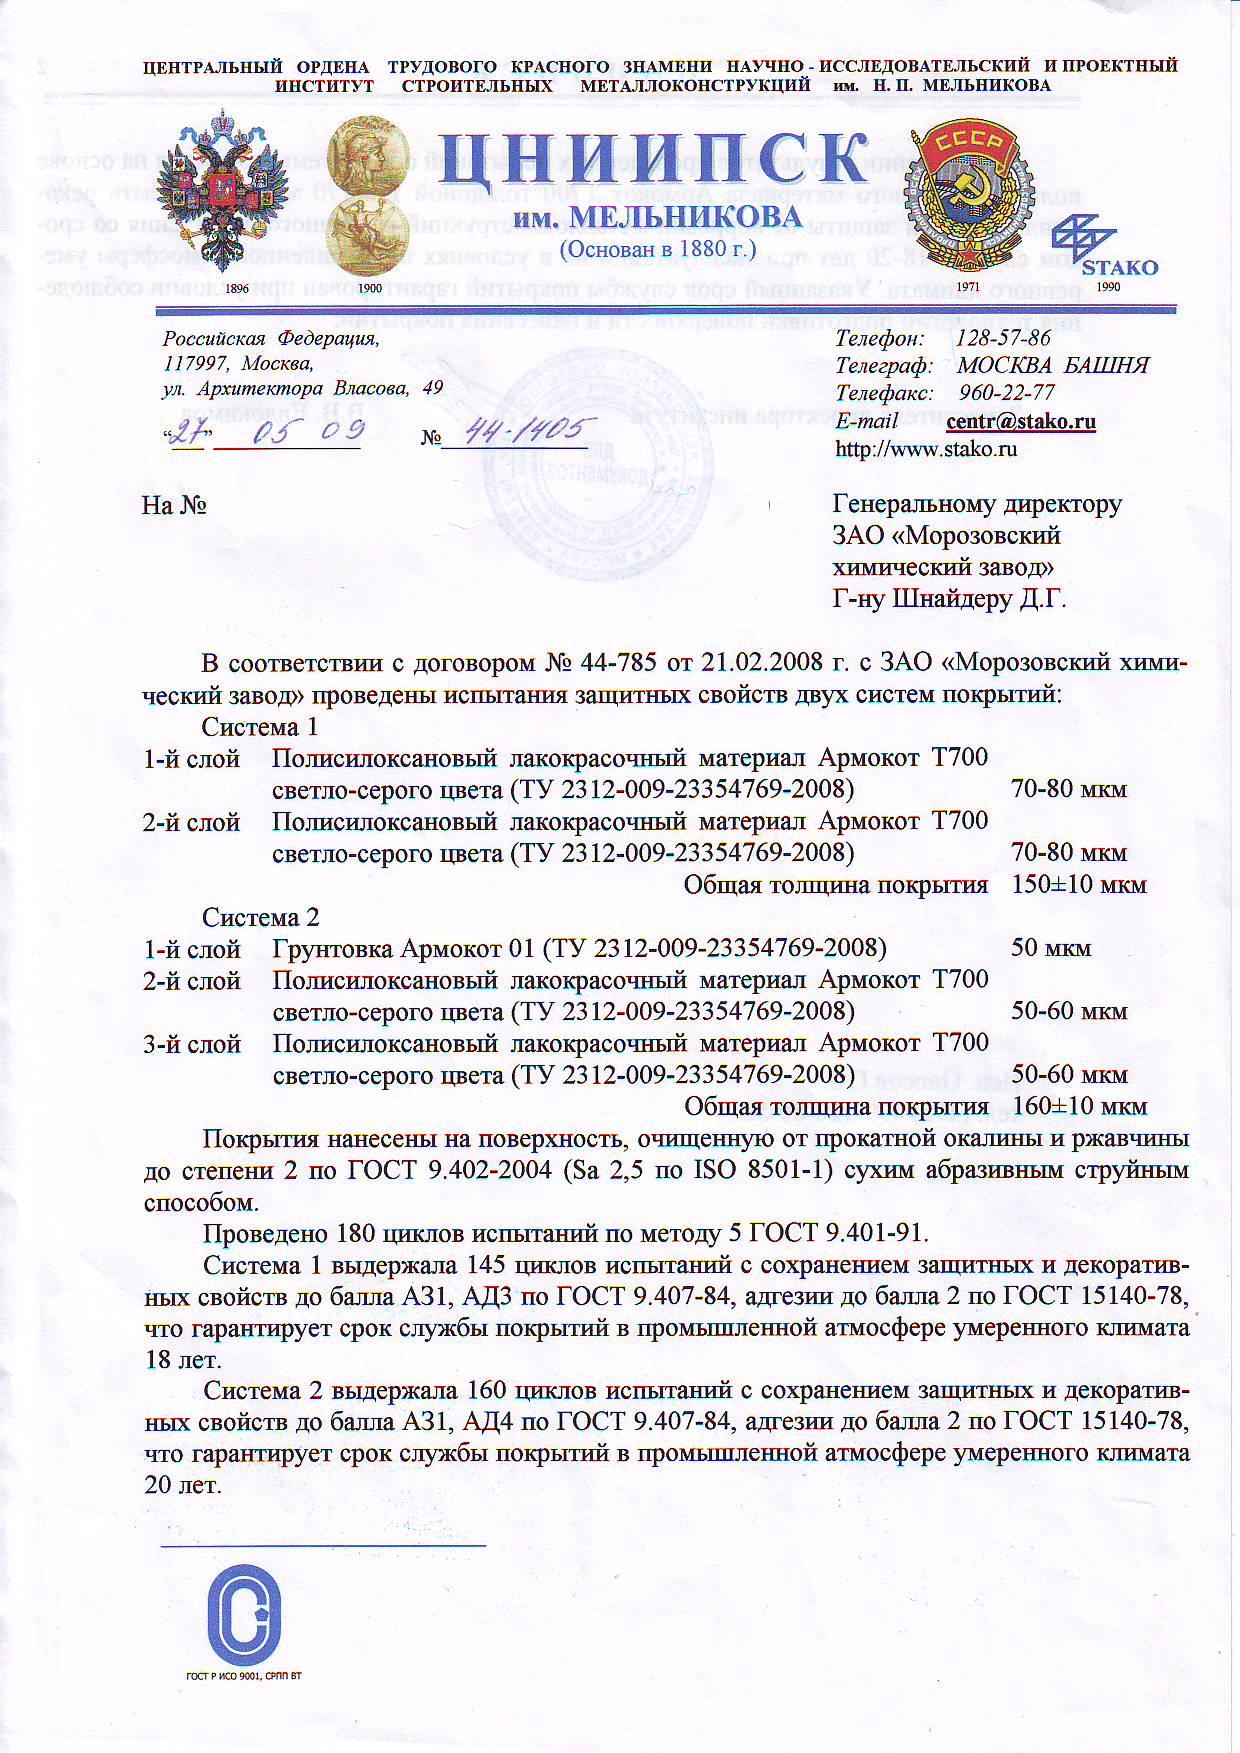 Армокот Т700 ЦНИИПСК им. Мельникова 20 лет_Страница_1